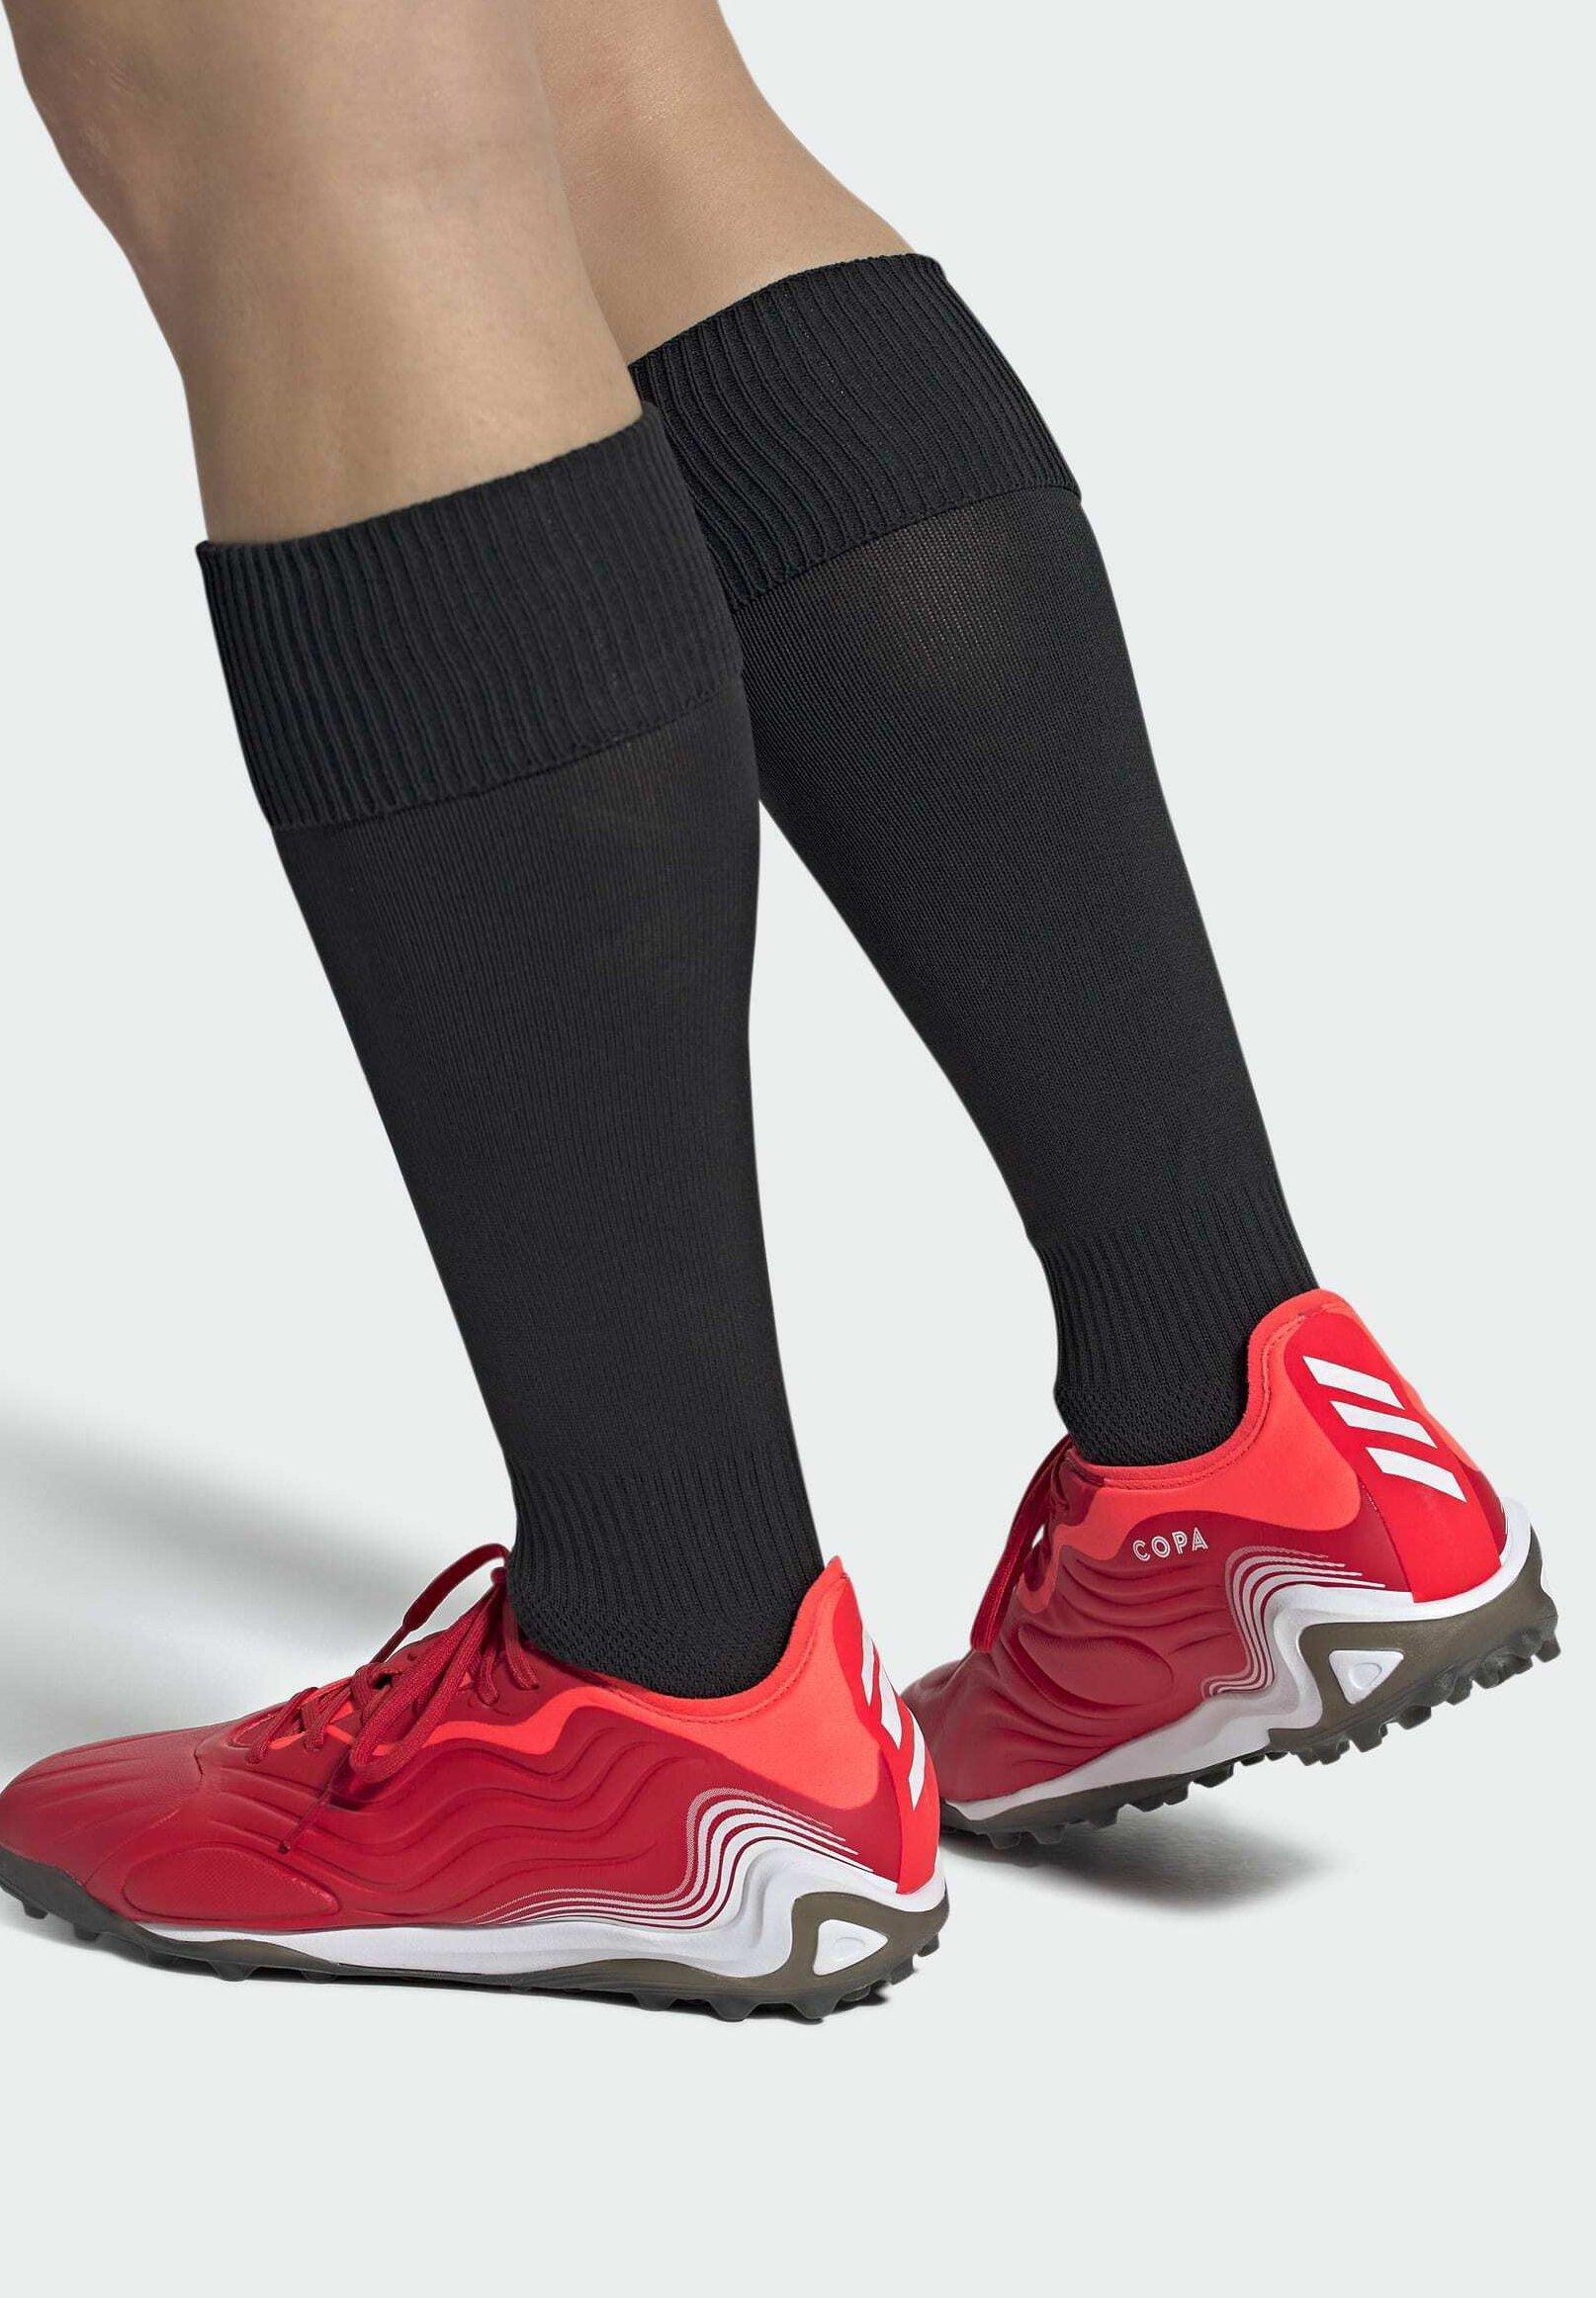 Homme Chaussures de foot multicrampons